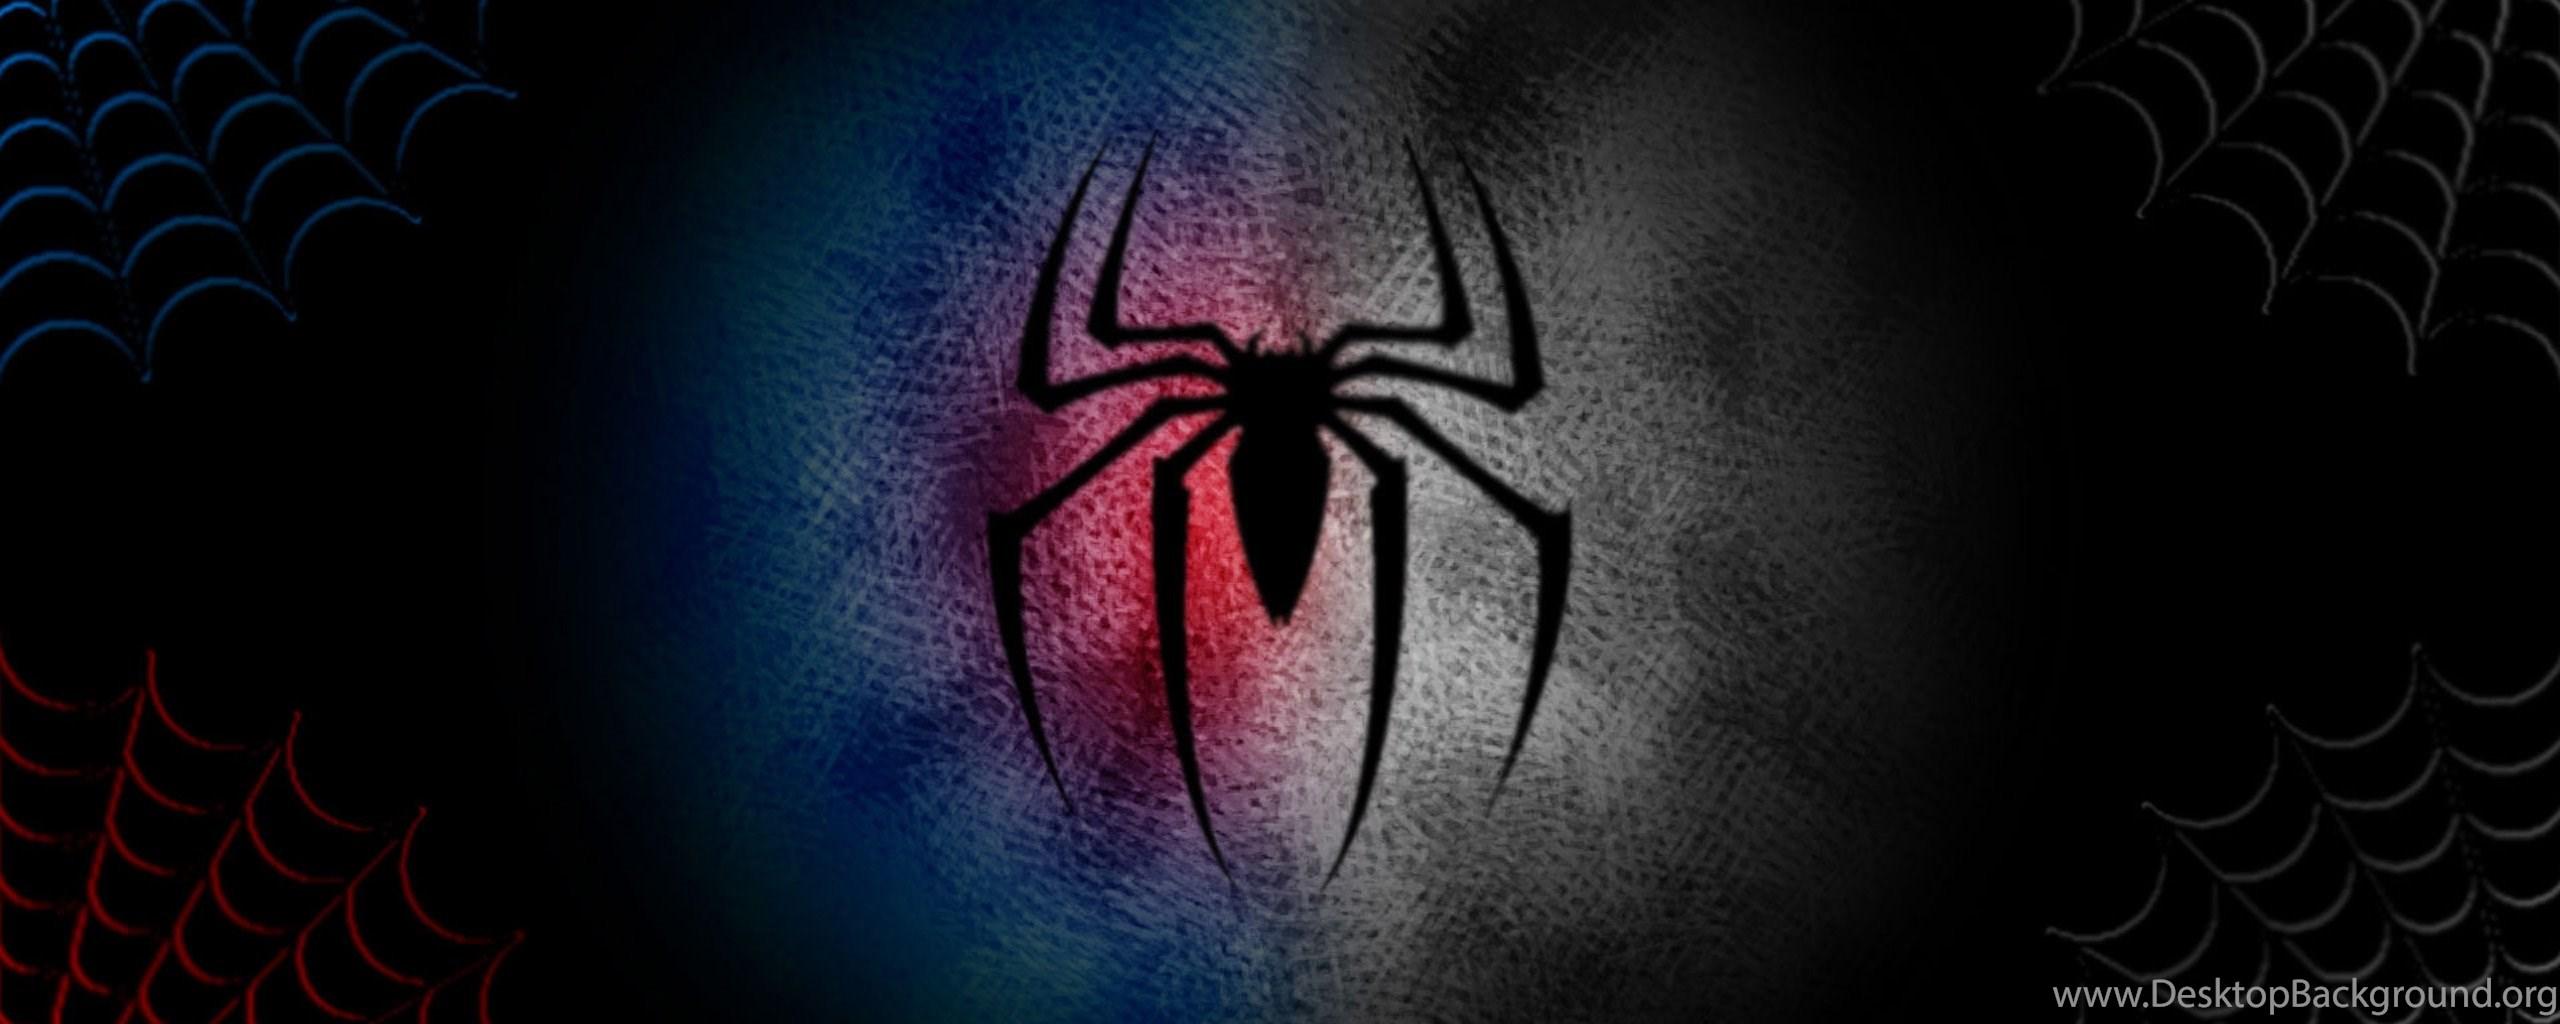 Spiderman Logo Wallpaper Hd Desktop Wallpapers Desktop Background